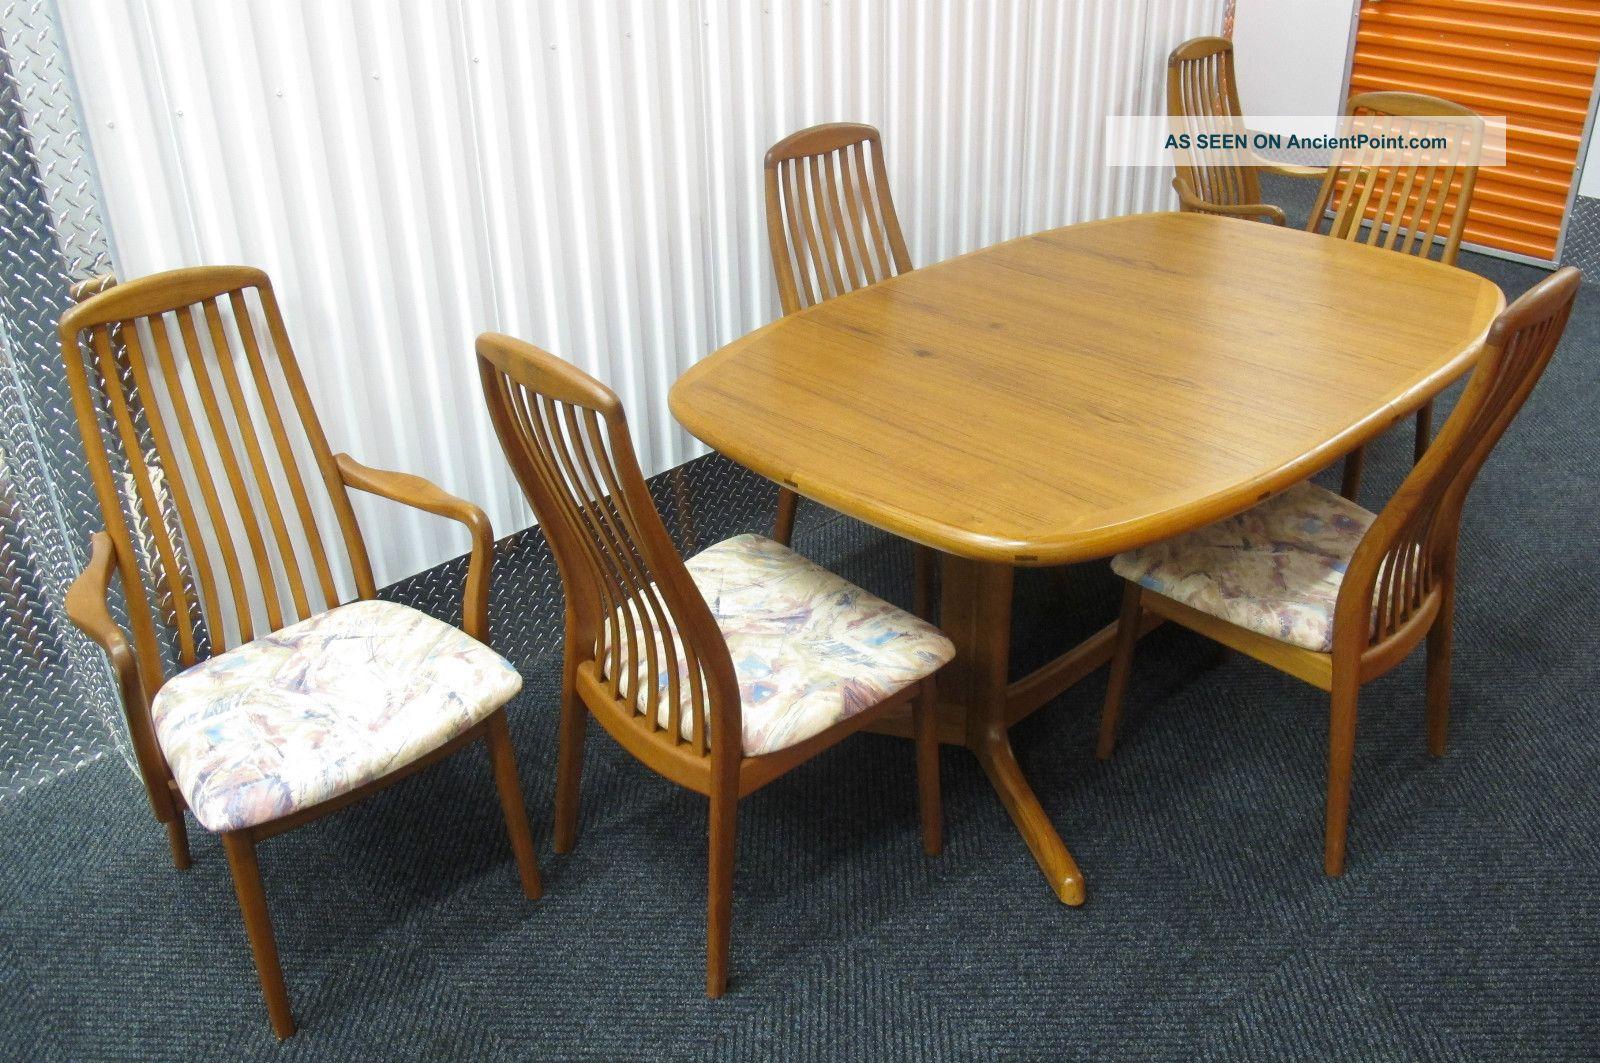 Amazing Mid Century Danish Modern Teak Dining Chairs 1600 x 1063 · 334 kB · jpeg